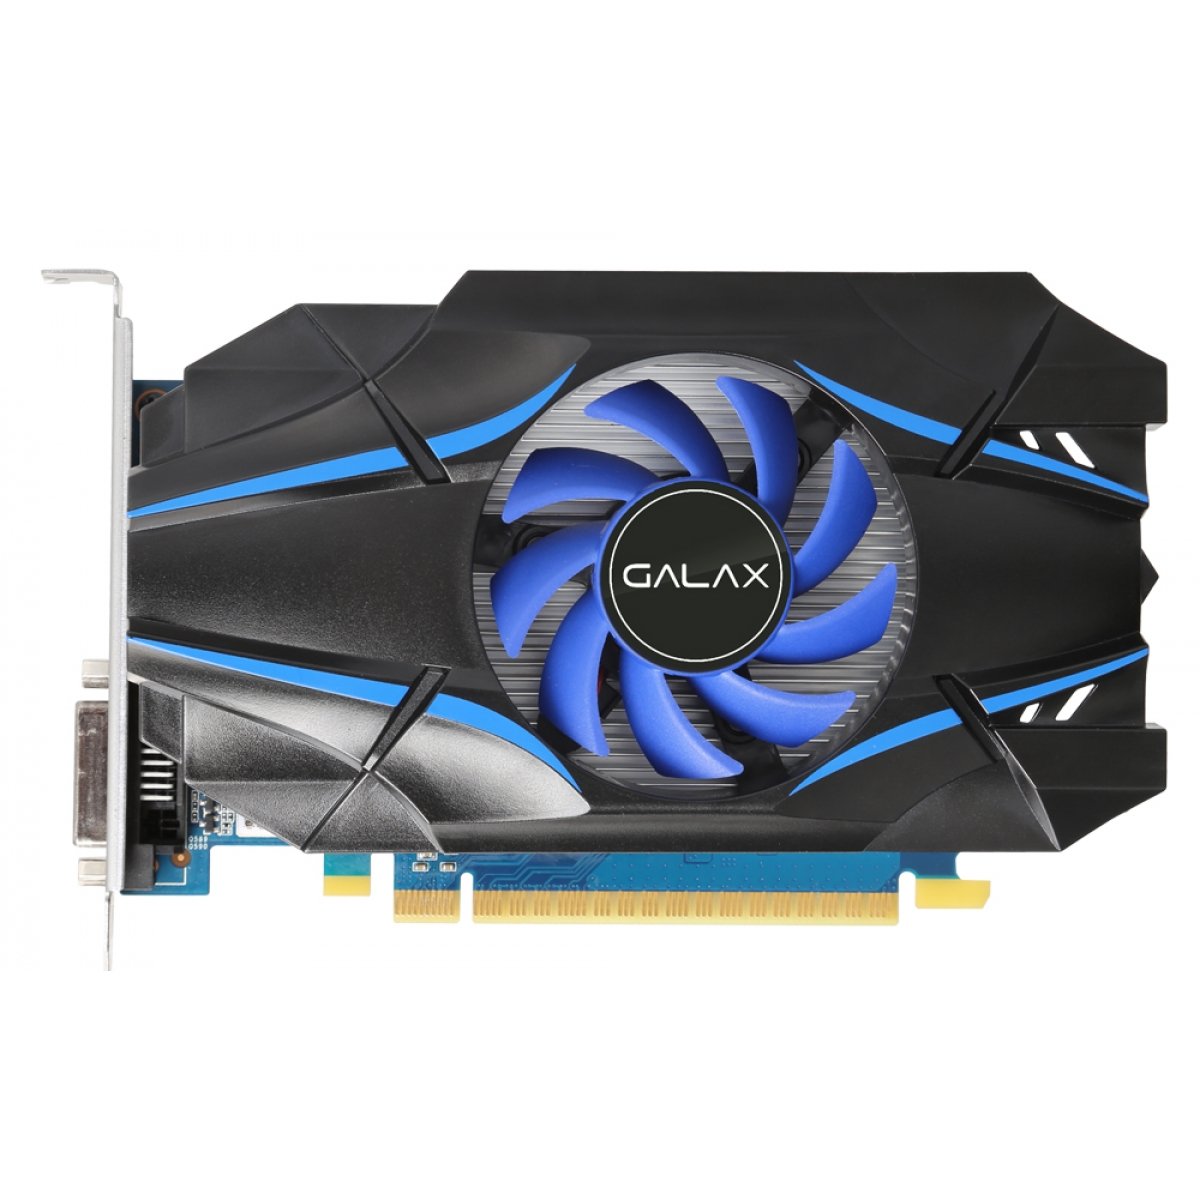 Placa de Vídeo Galax GeForce GT 1030 2GB 30NPH4HVQ4ST GDDR5 PCI-EXP